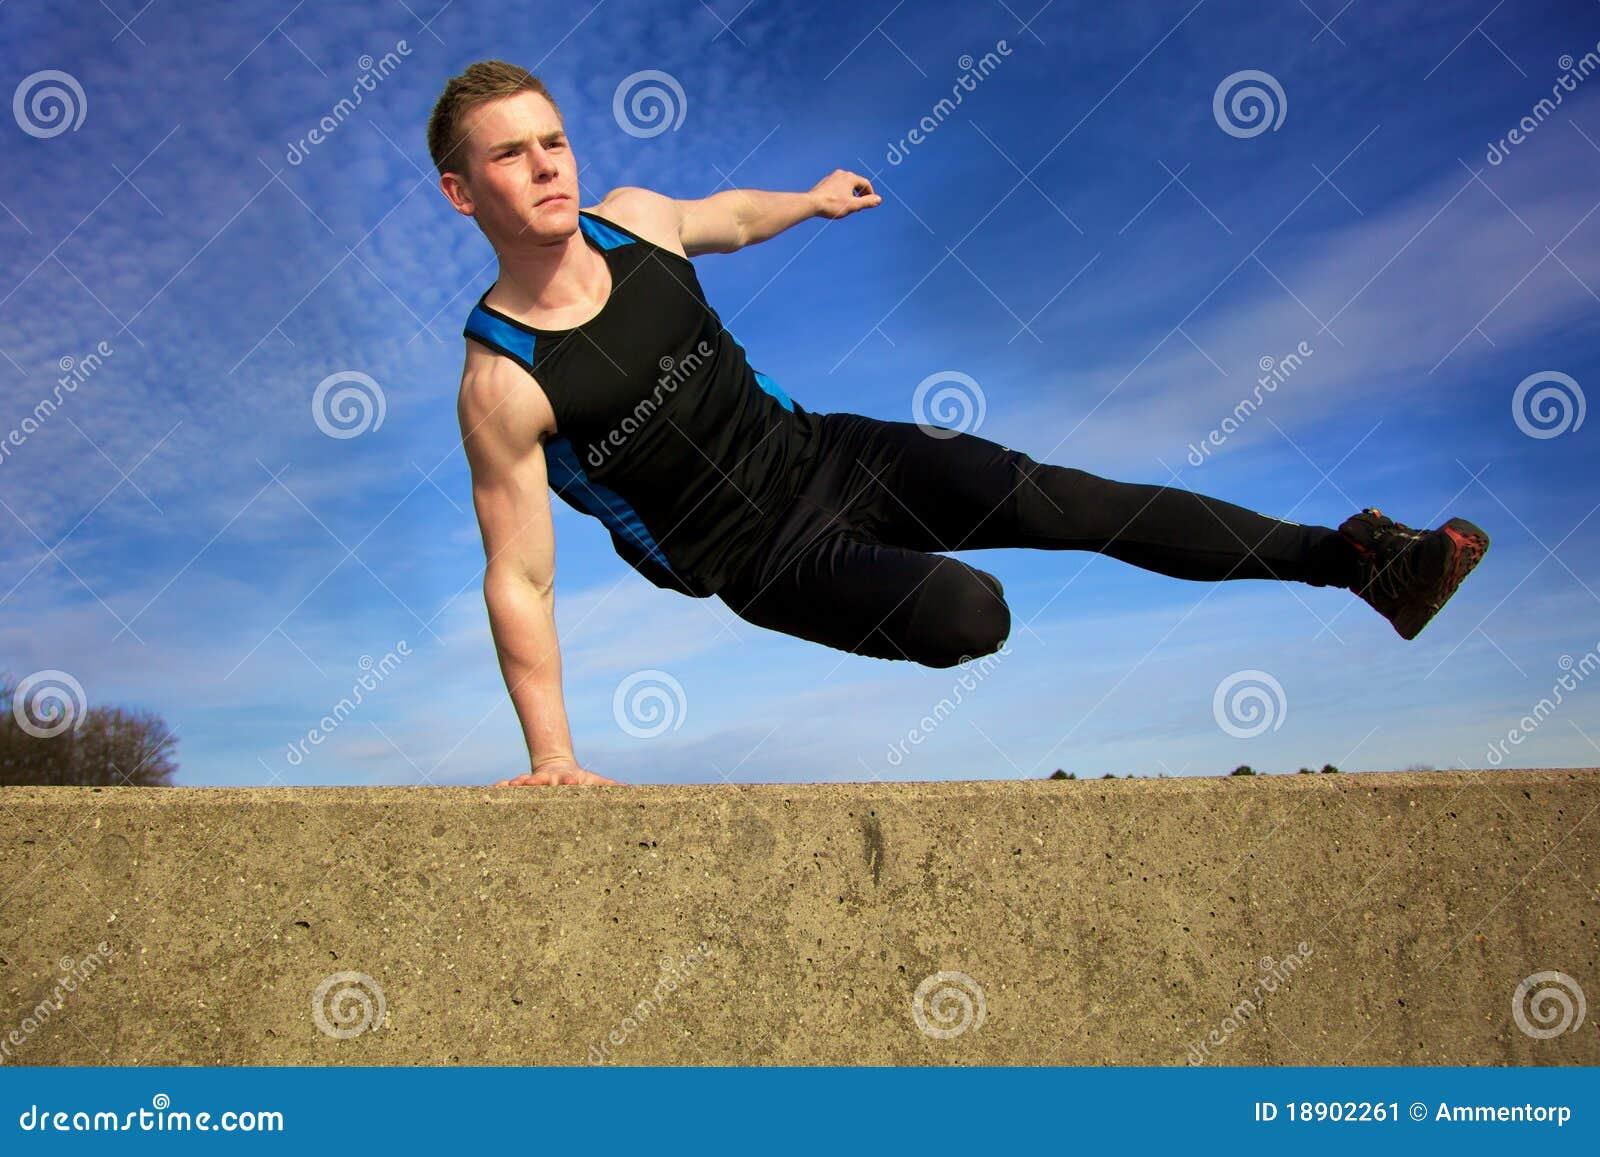 Jump over wall